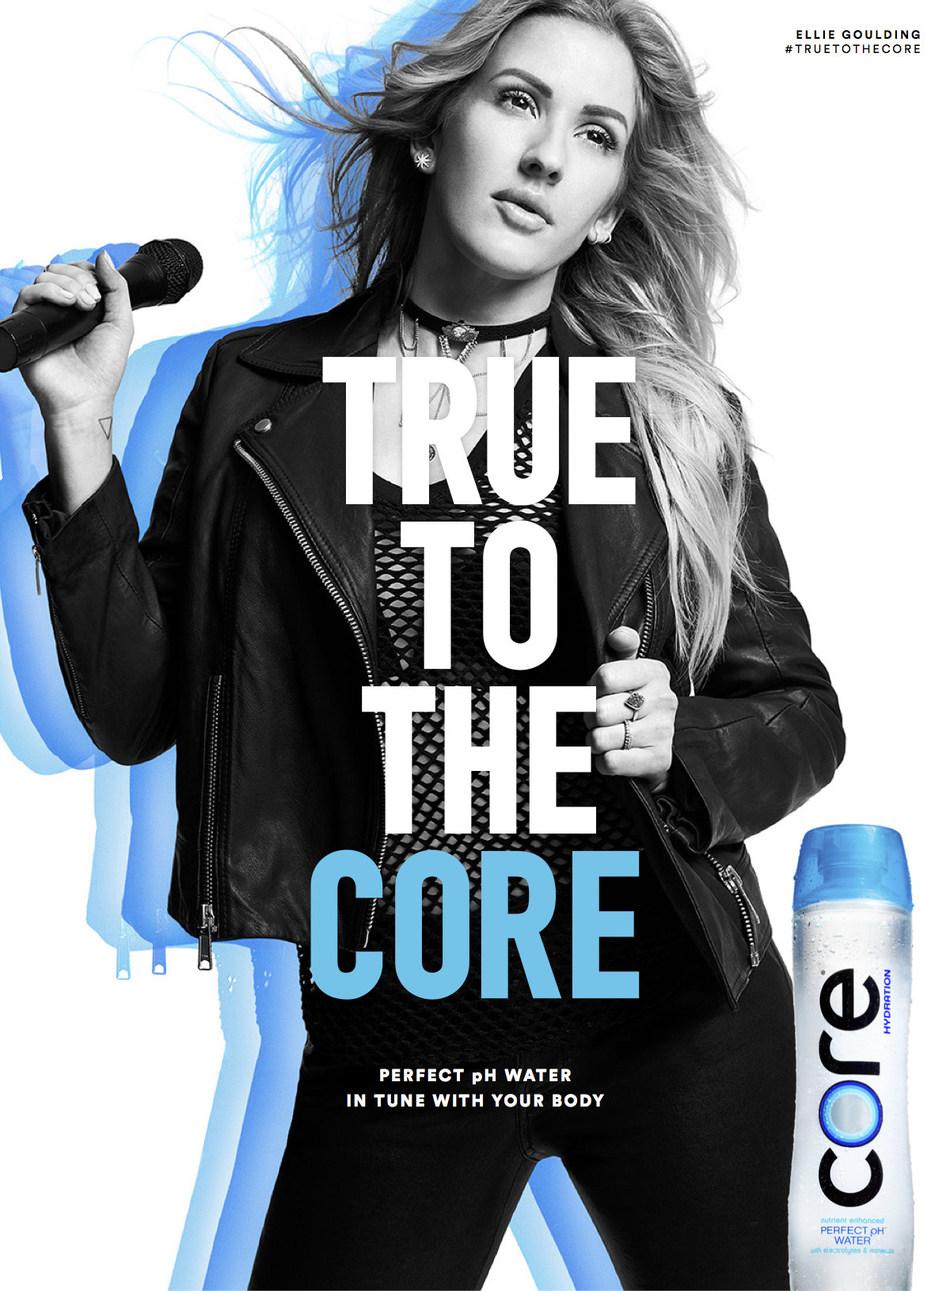 Ellie Goulding for #TrueToTheCORE